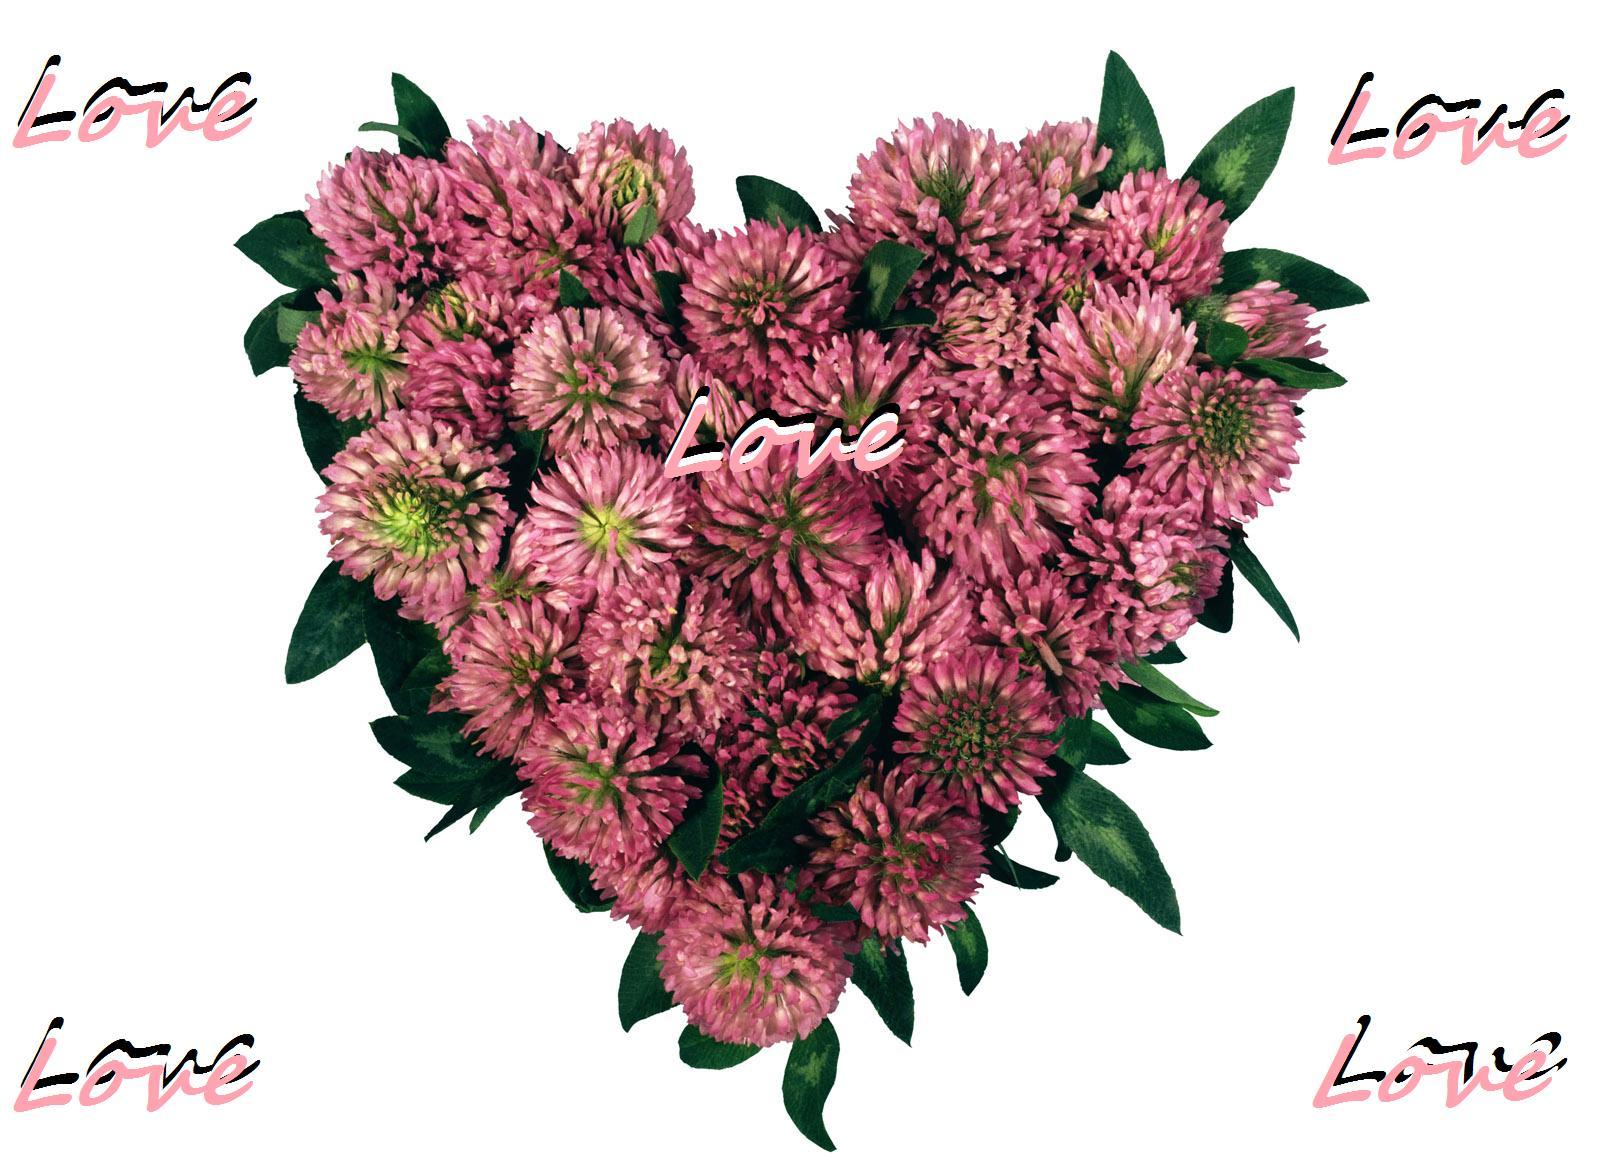 love heart shaped flowerflower - photo #33